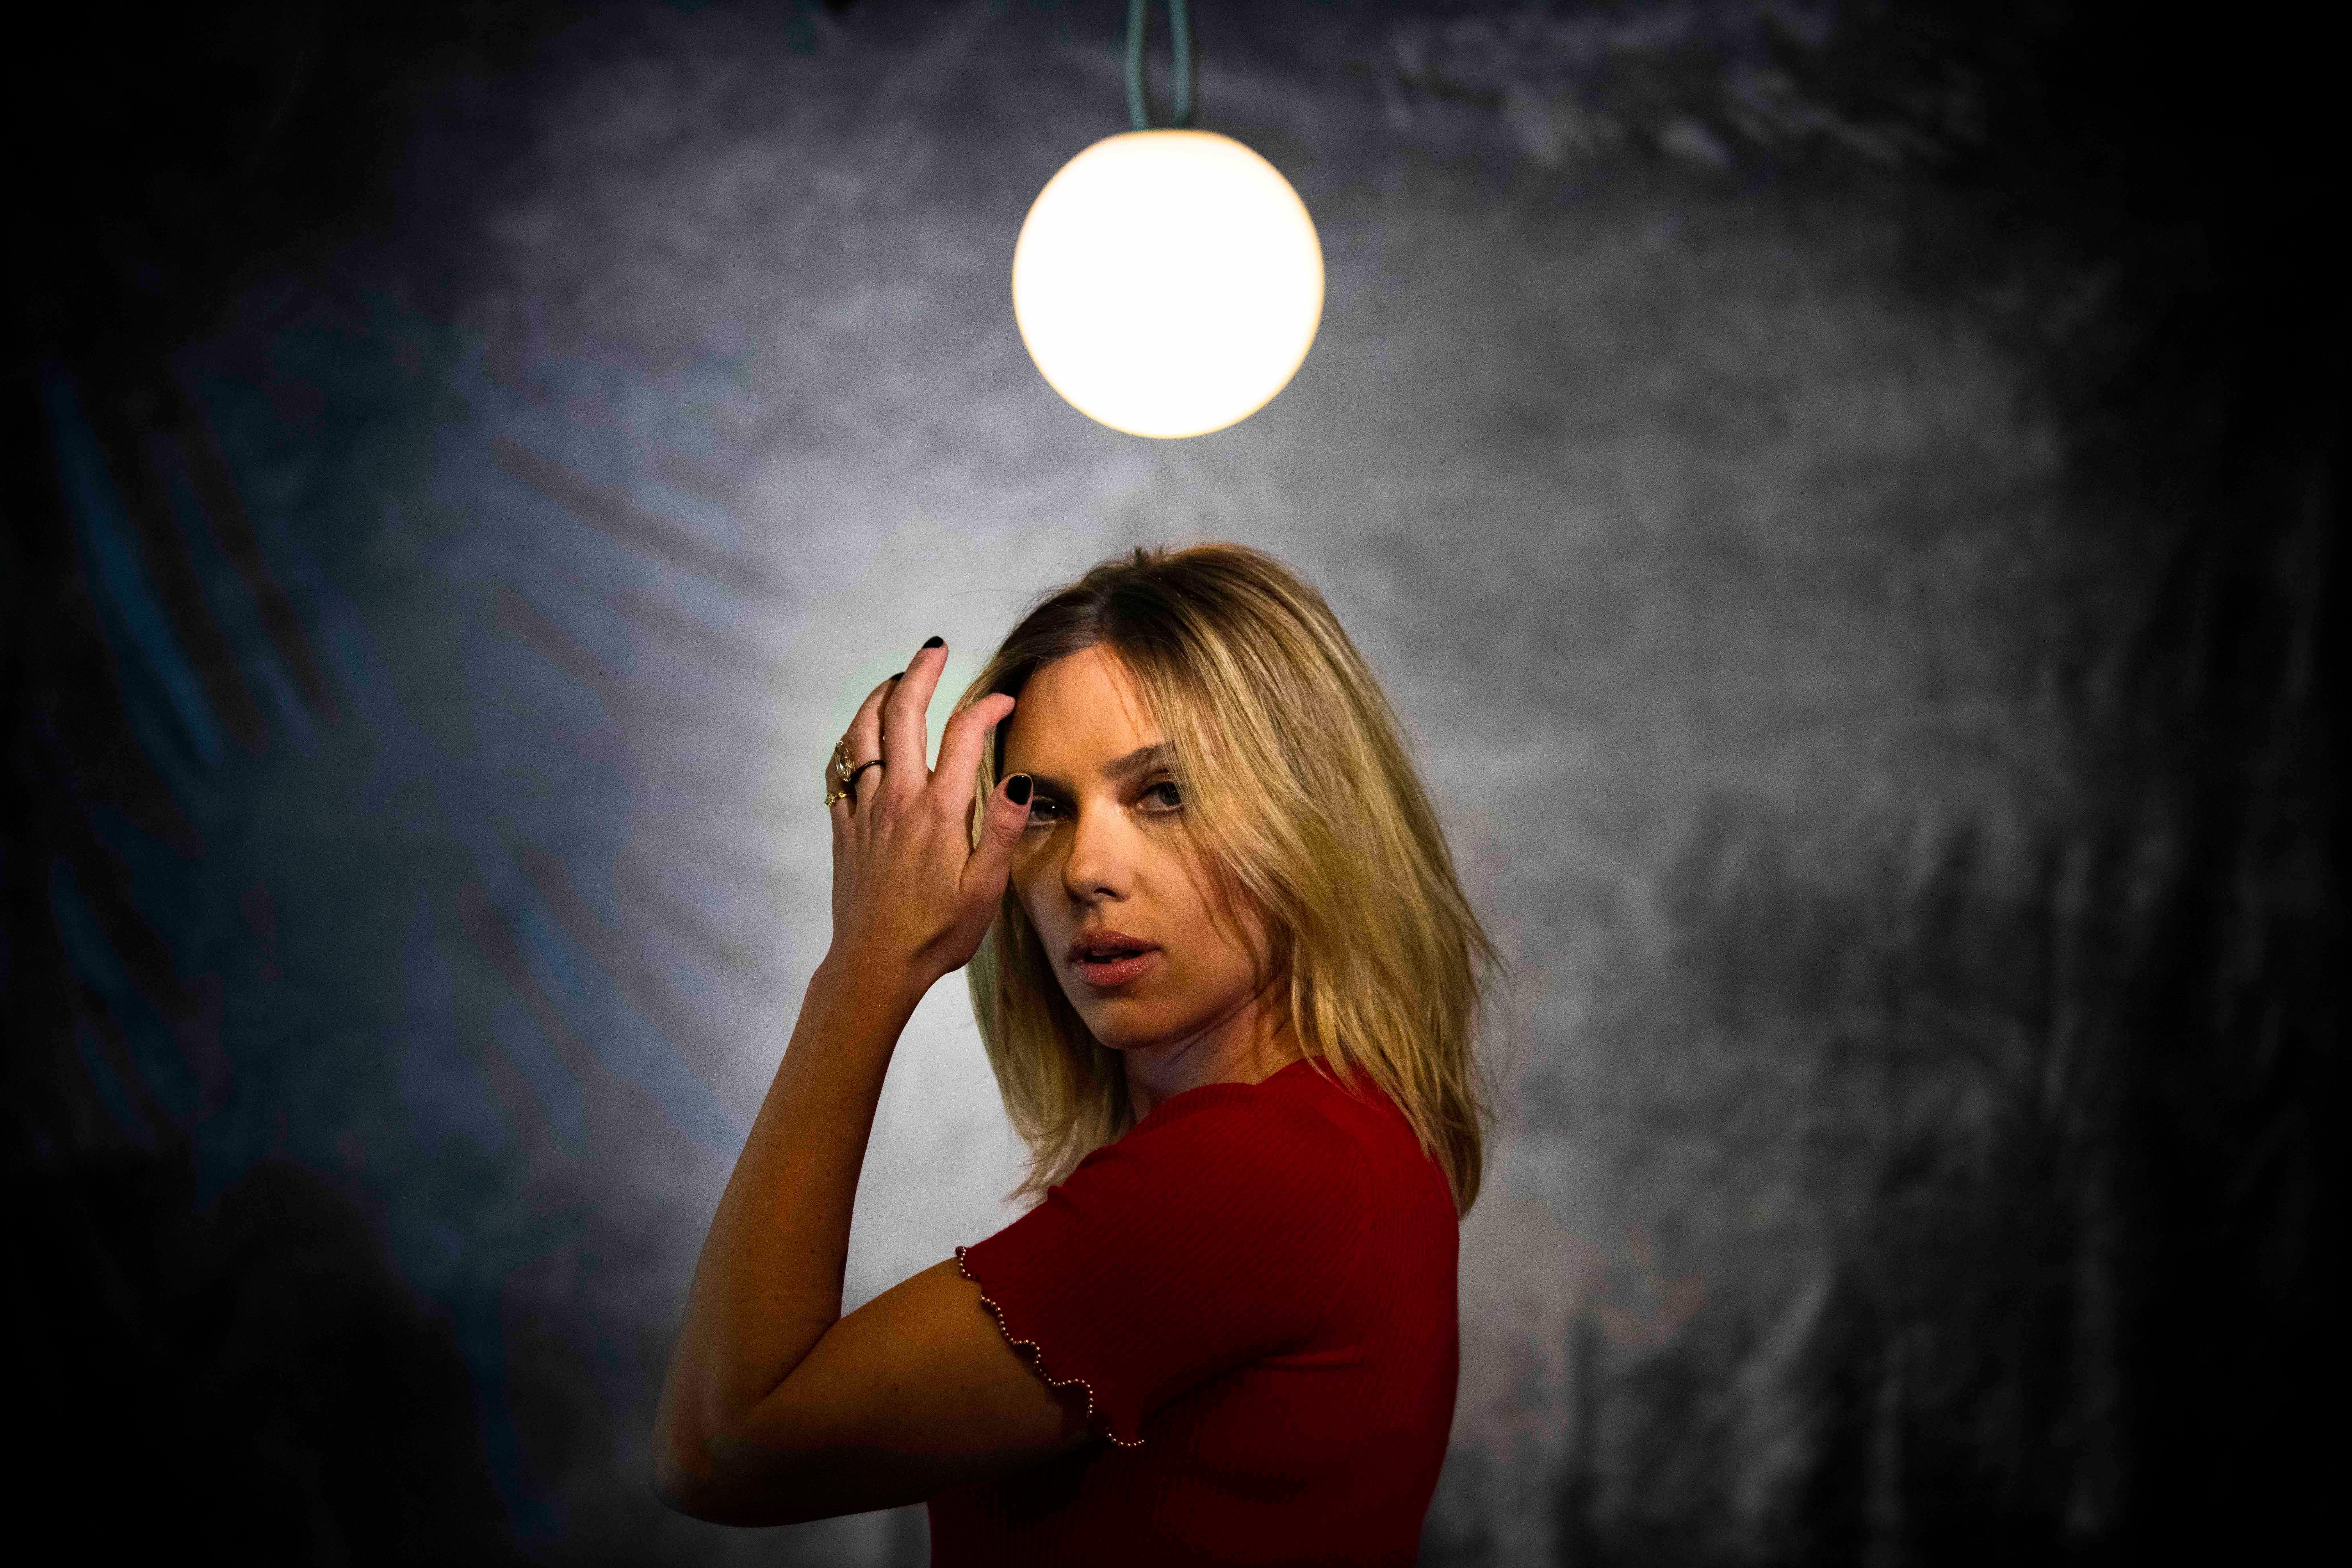 scarlett johansson usa today 1574936657 - Scarlett Johansson USA Today -